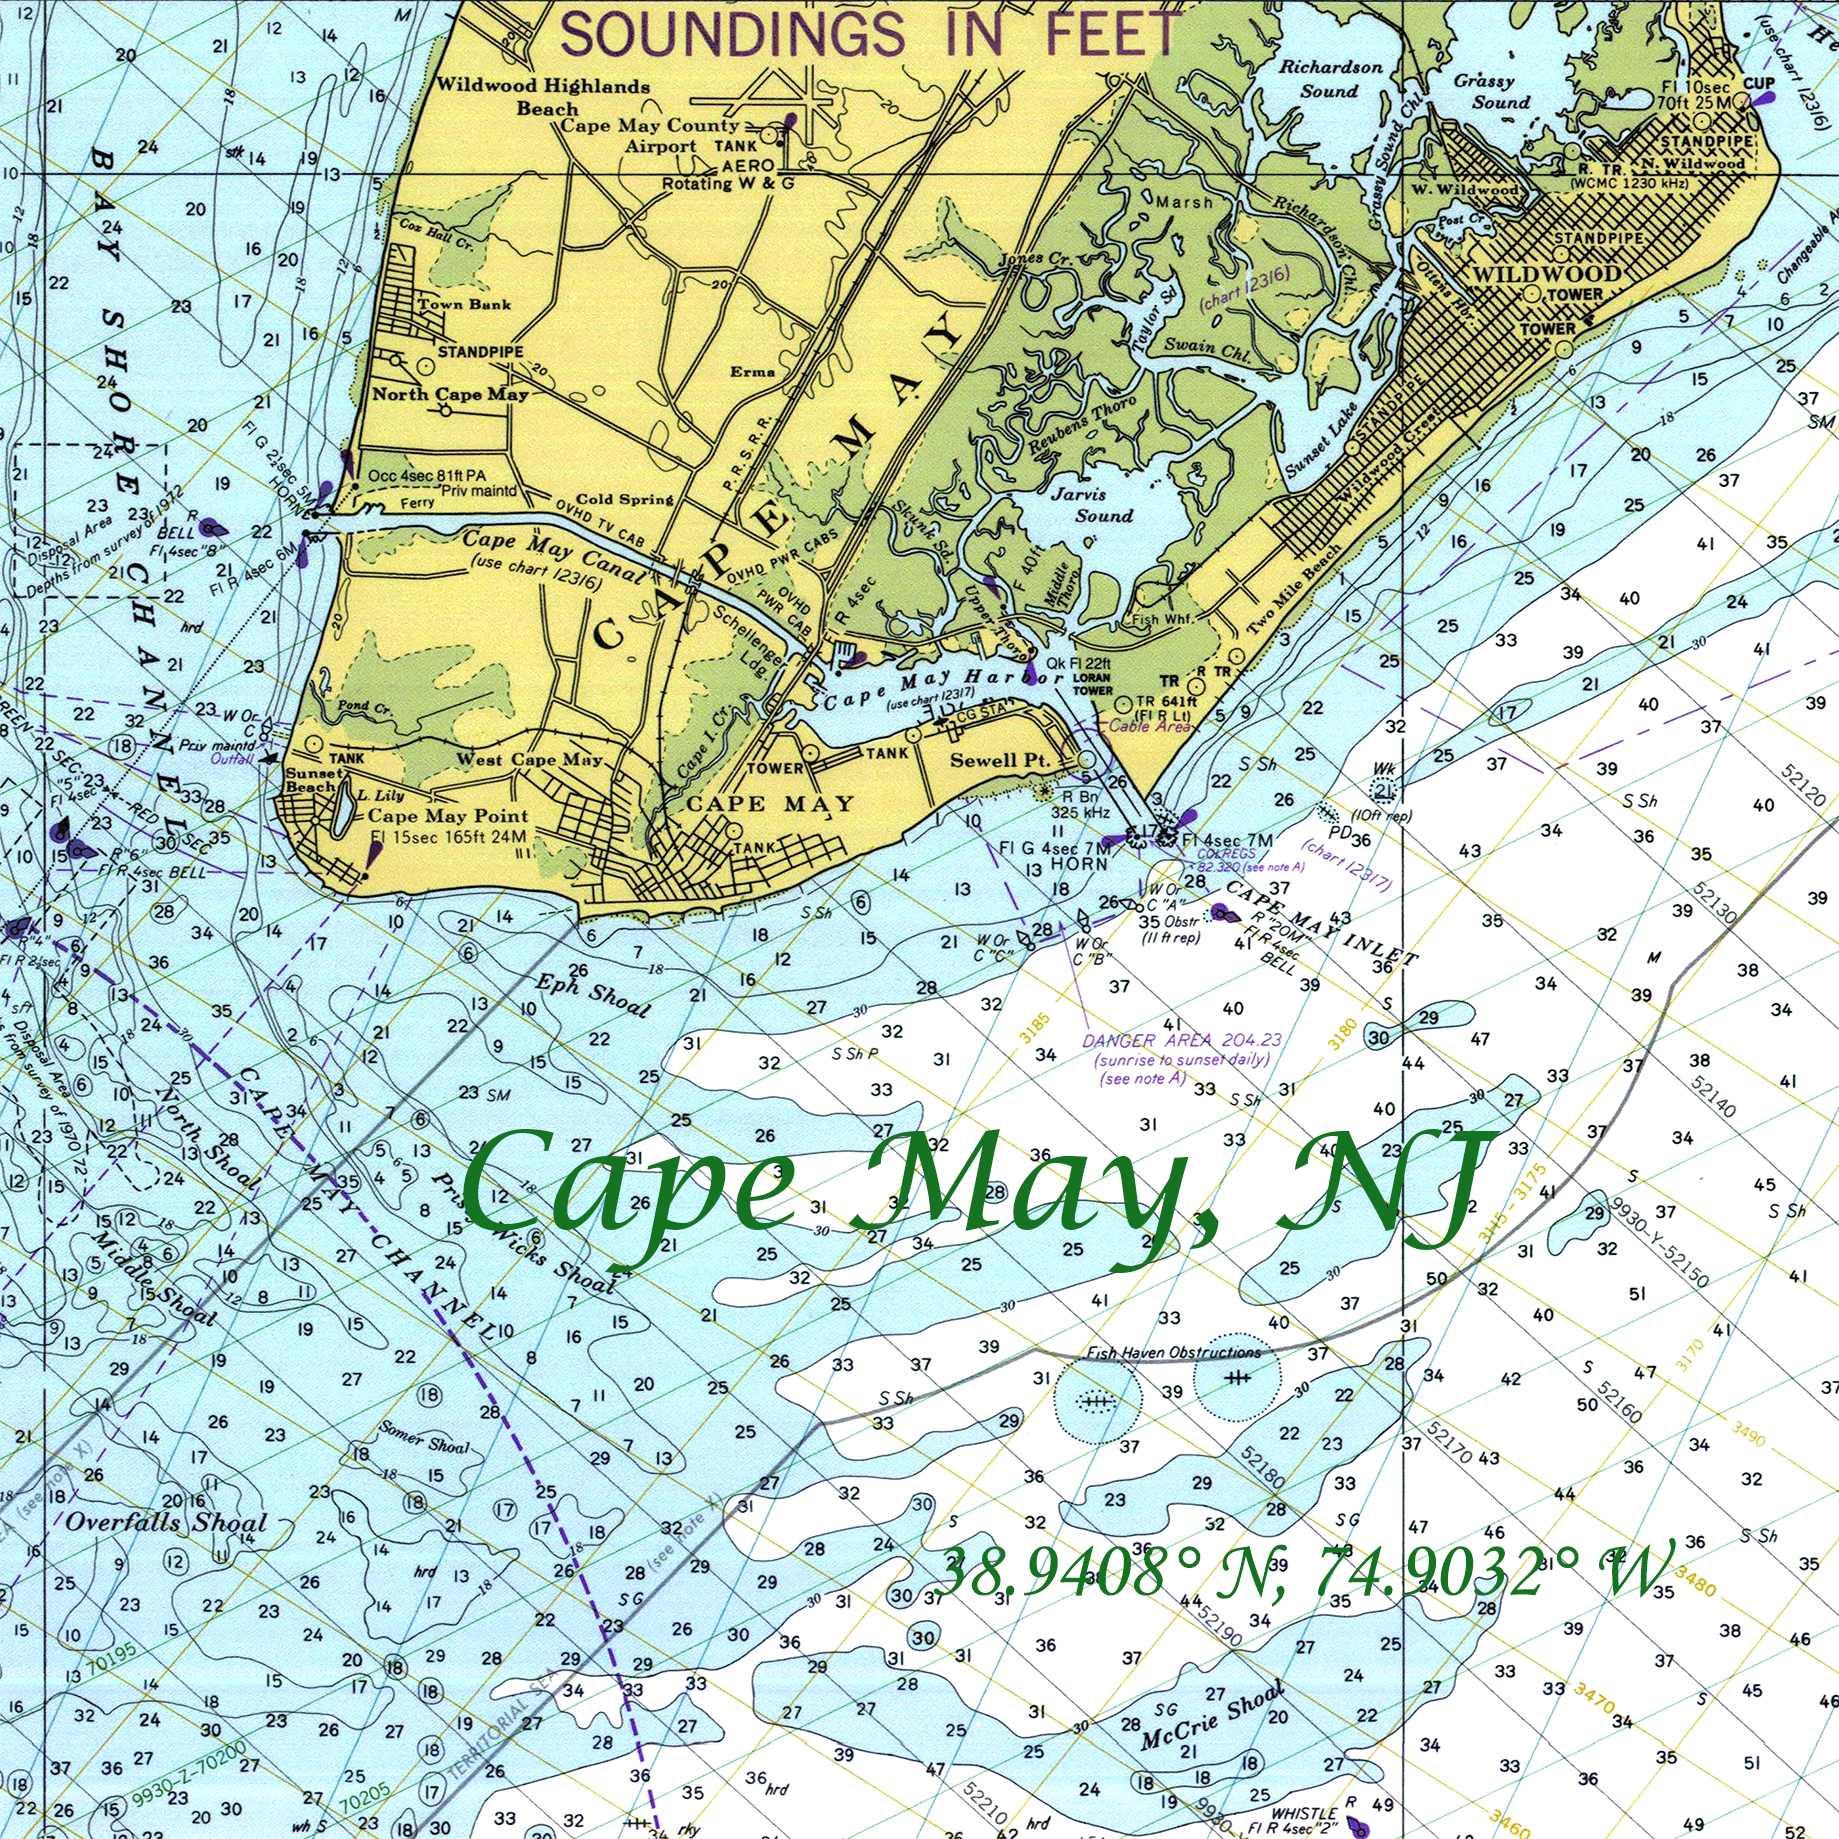 AB2720-T cape may naut trivet.jpg